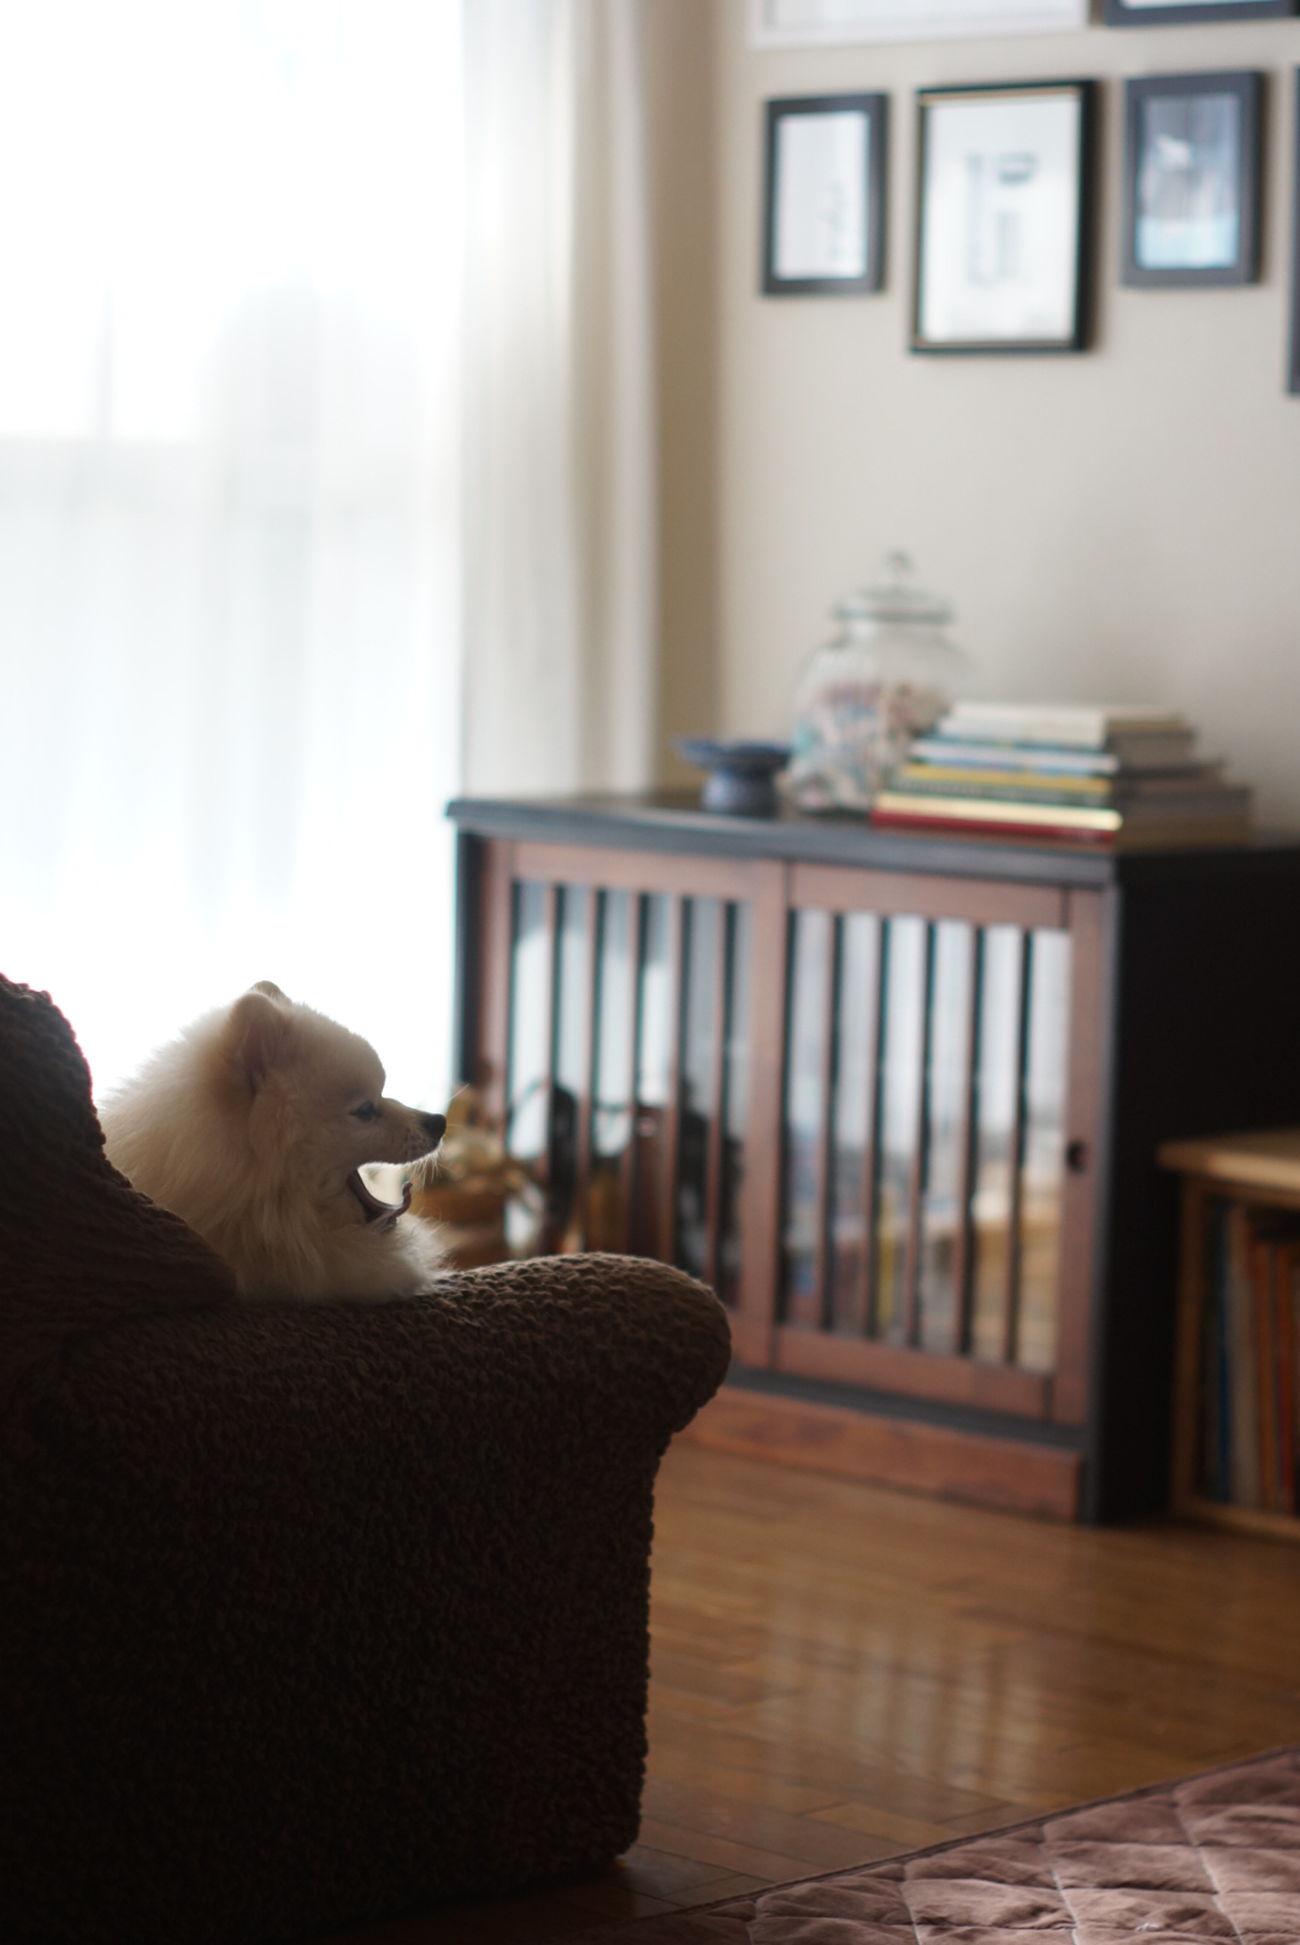 Living Room Indoors  Sofa Day Nofilter Sony Nex-5t Minolta58mmf14 オールドレンズ Oldlens Mylovelydog EyeEm Dogs Pomeranian ポメラニアン Dog Relaxing Relaxation